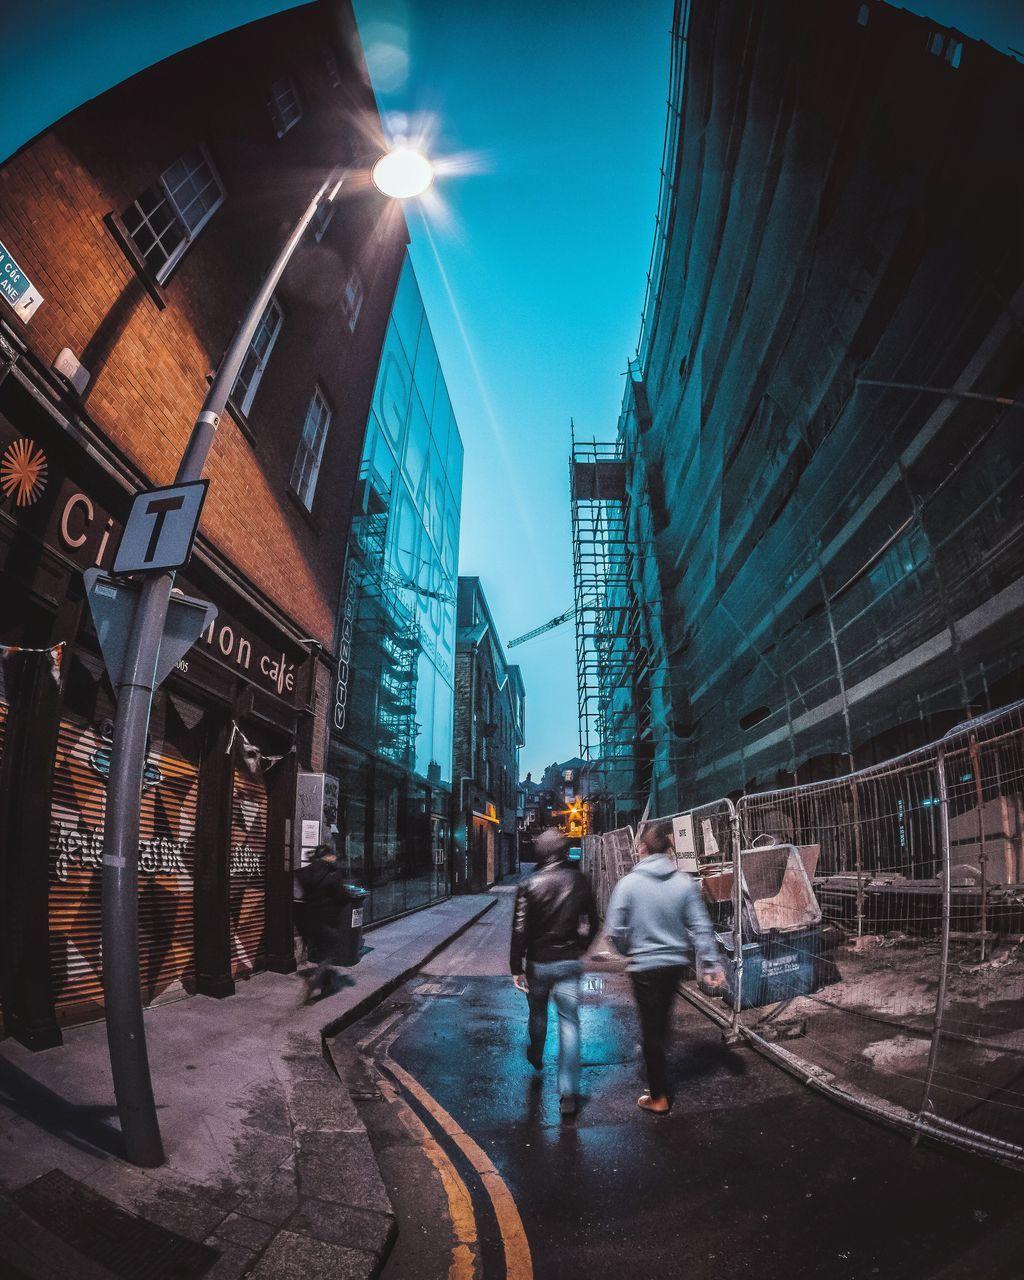 Fish-Eye Lens Of People Walking On City Street